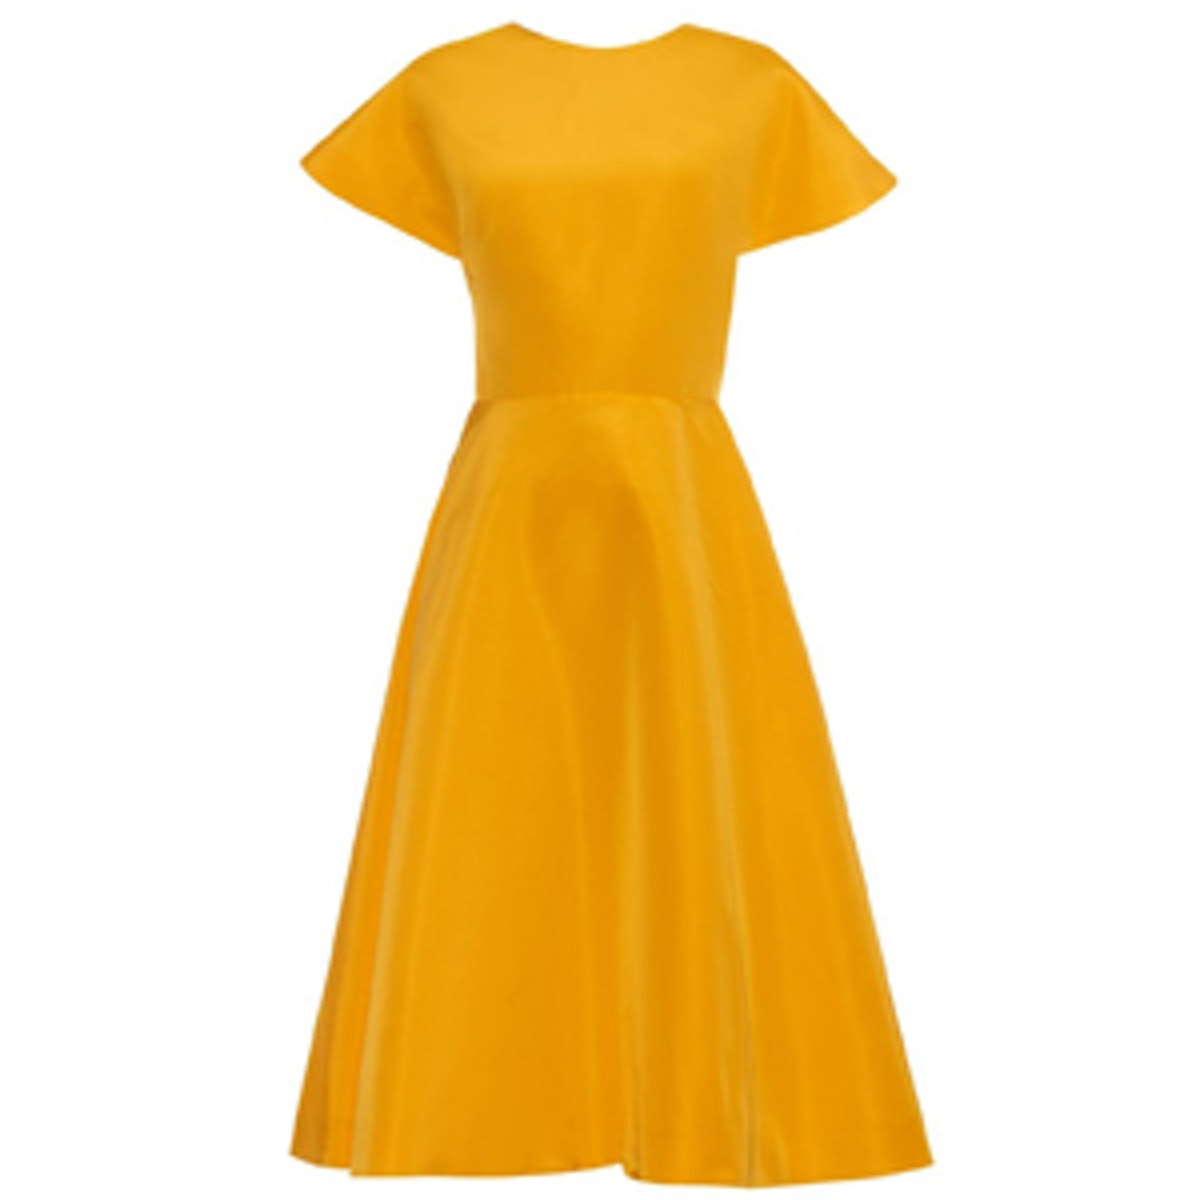 Buttercup Cotton-Faille Dress